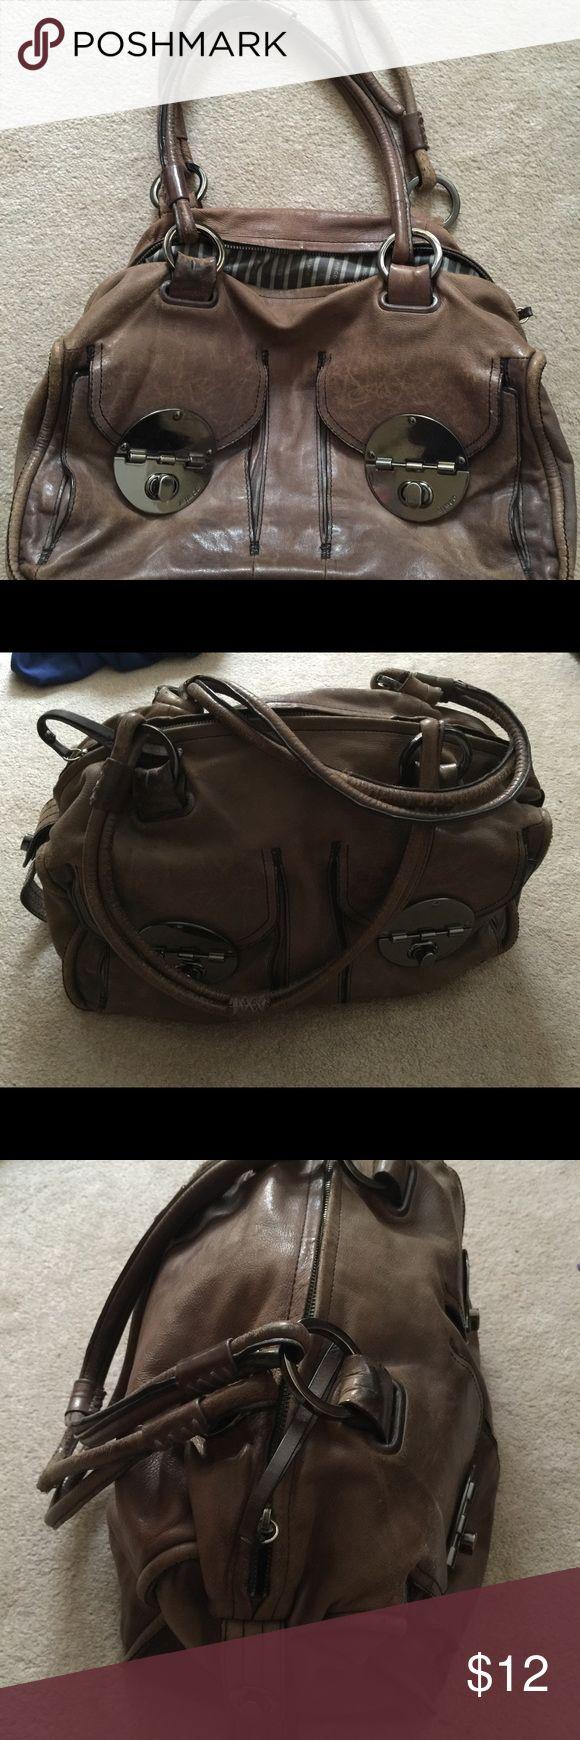 56 Off Coach Handbags Coach Mini Toiletry Or Make Up Kit From Erin - Mimco handbag